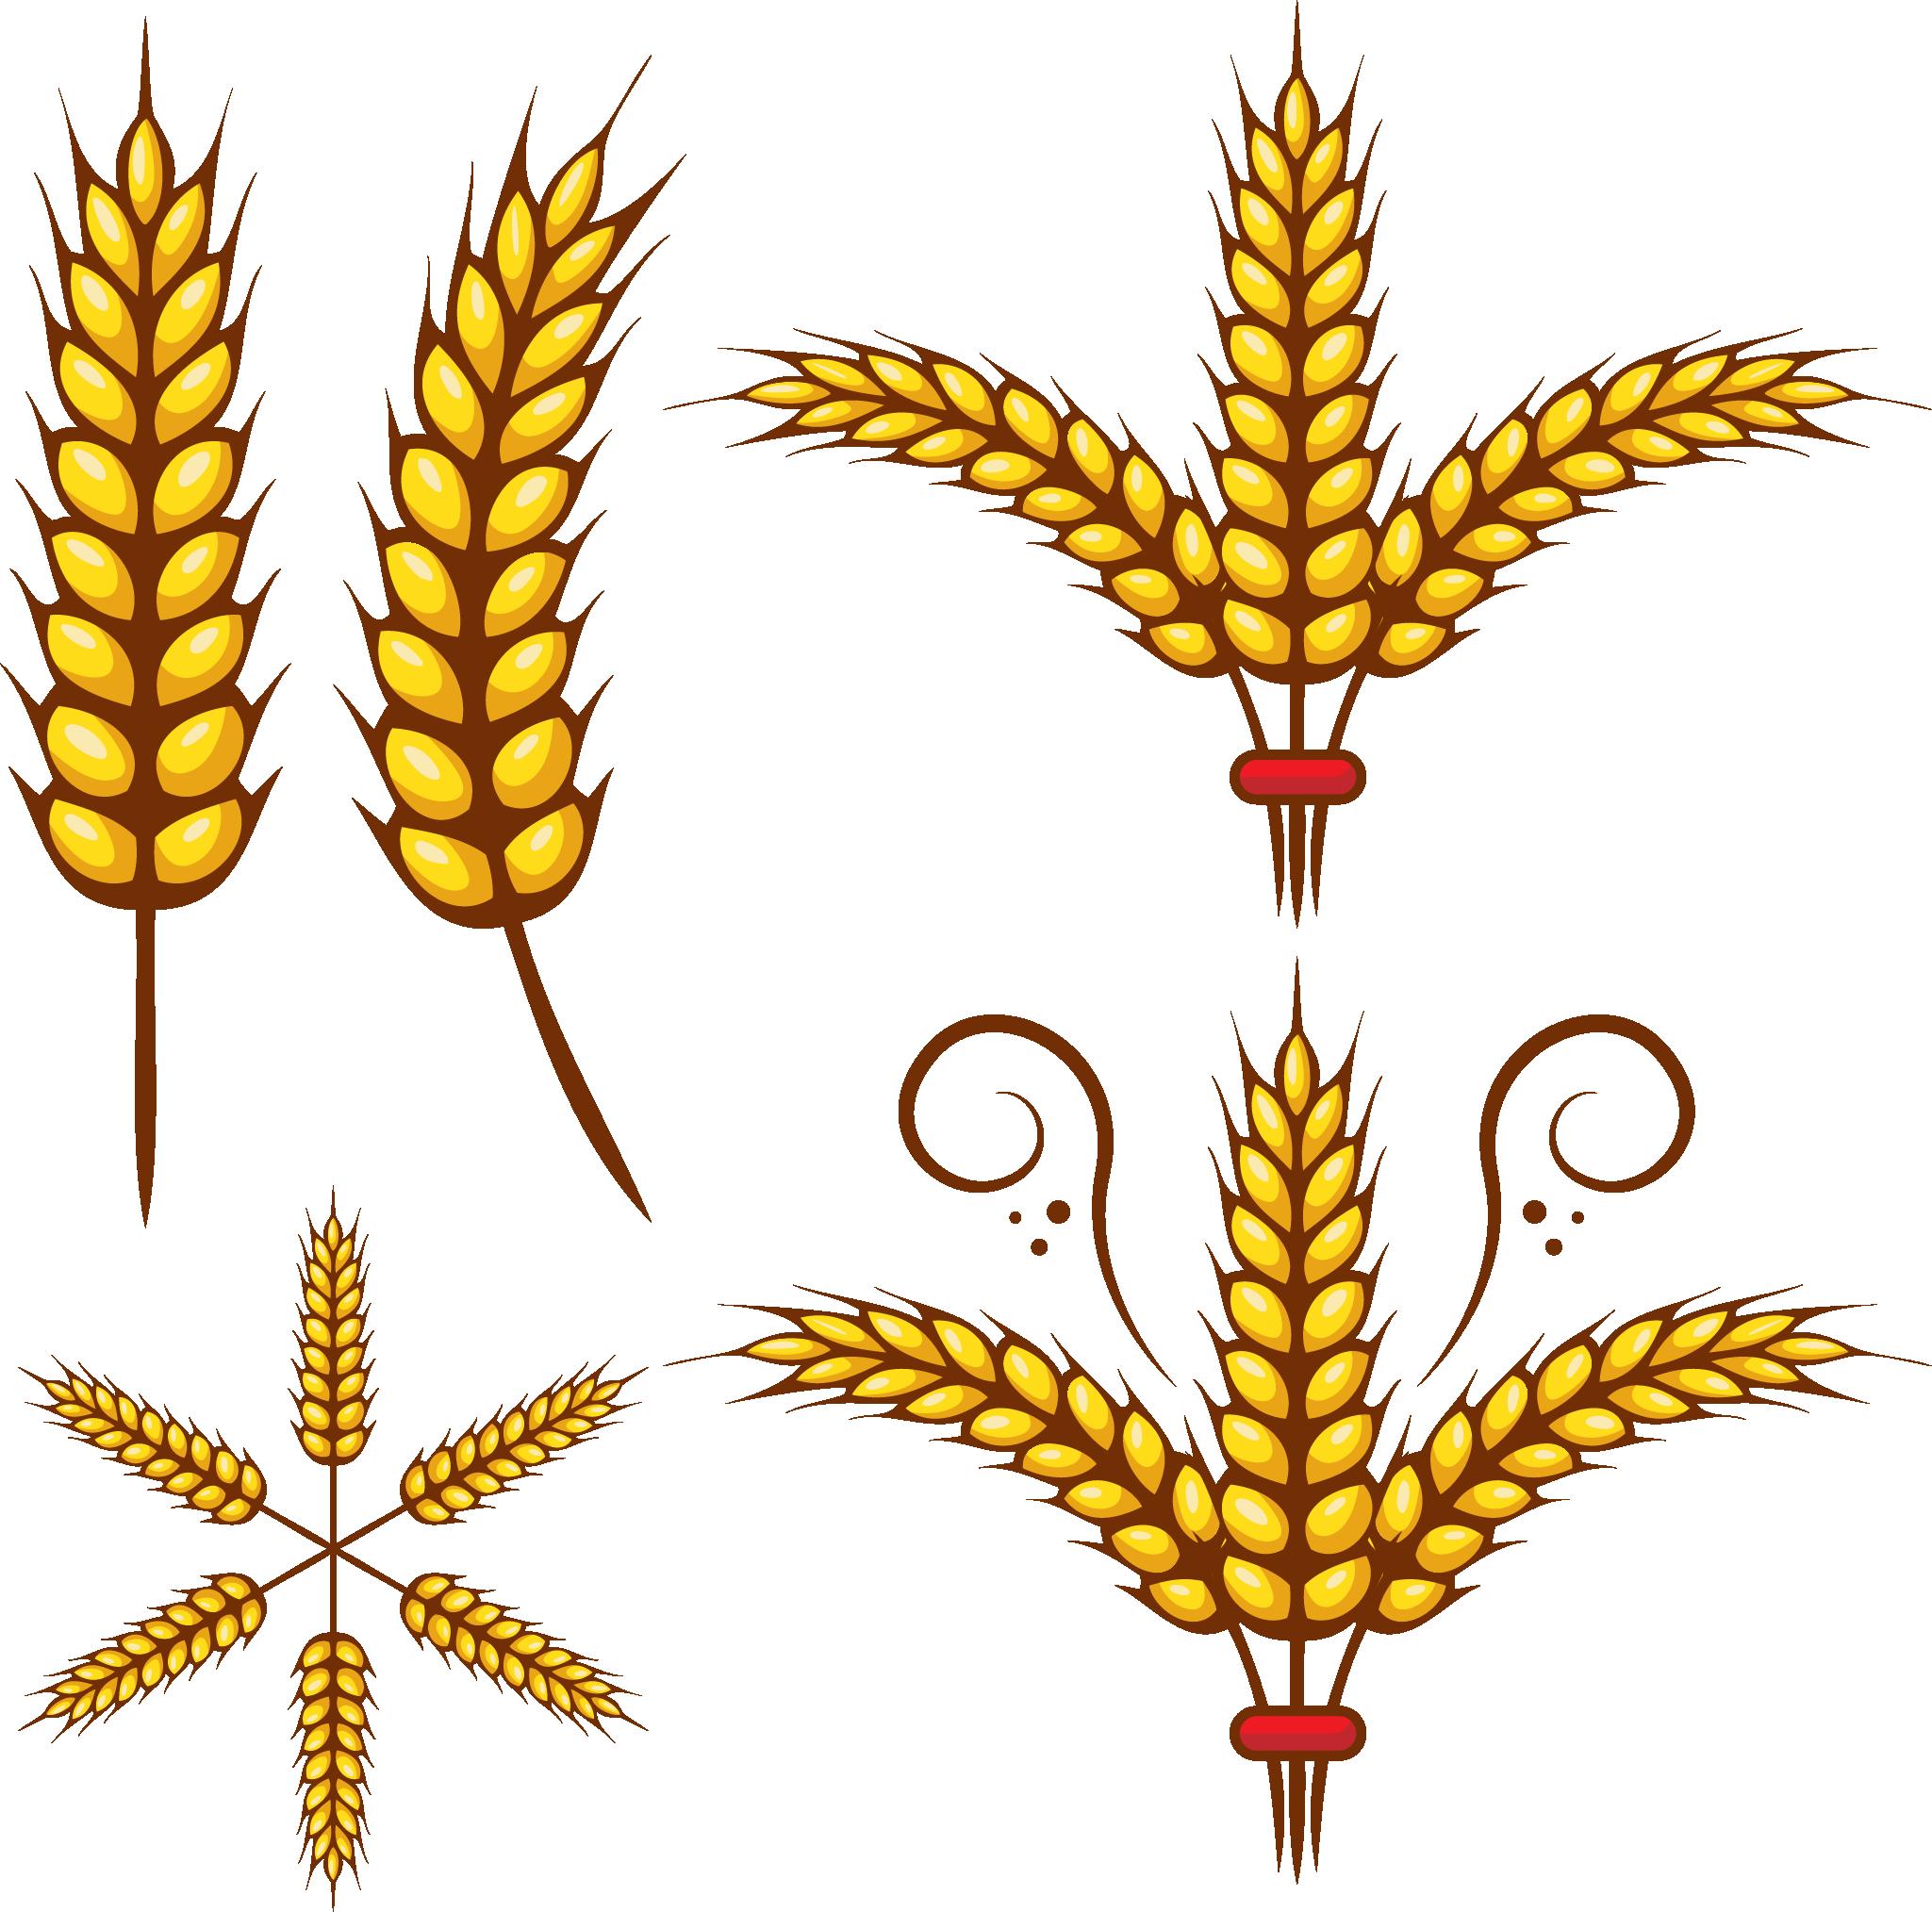 Grains leaf free on. Wheat clipart jpeg